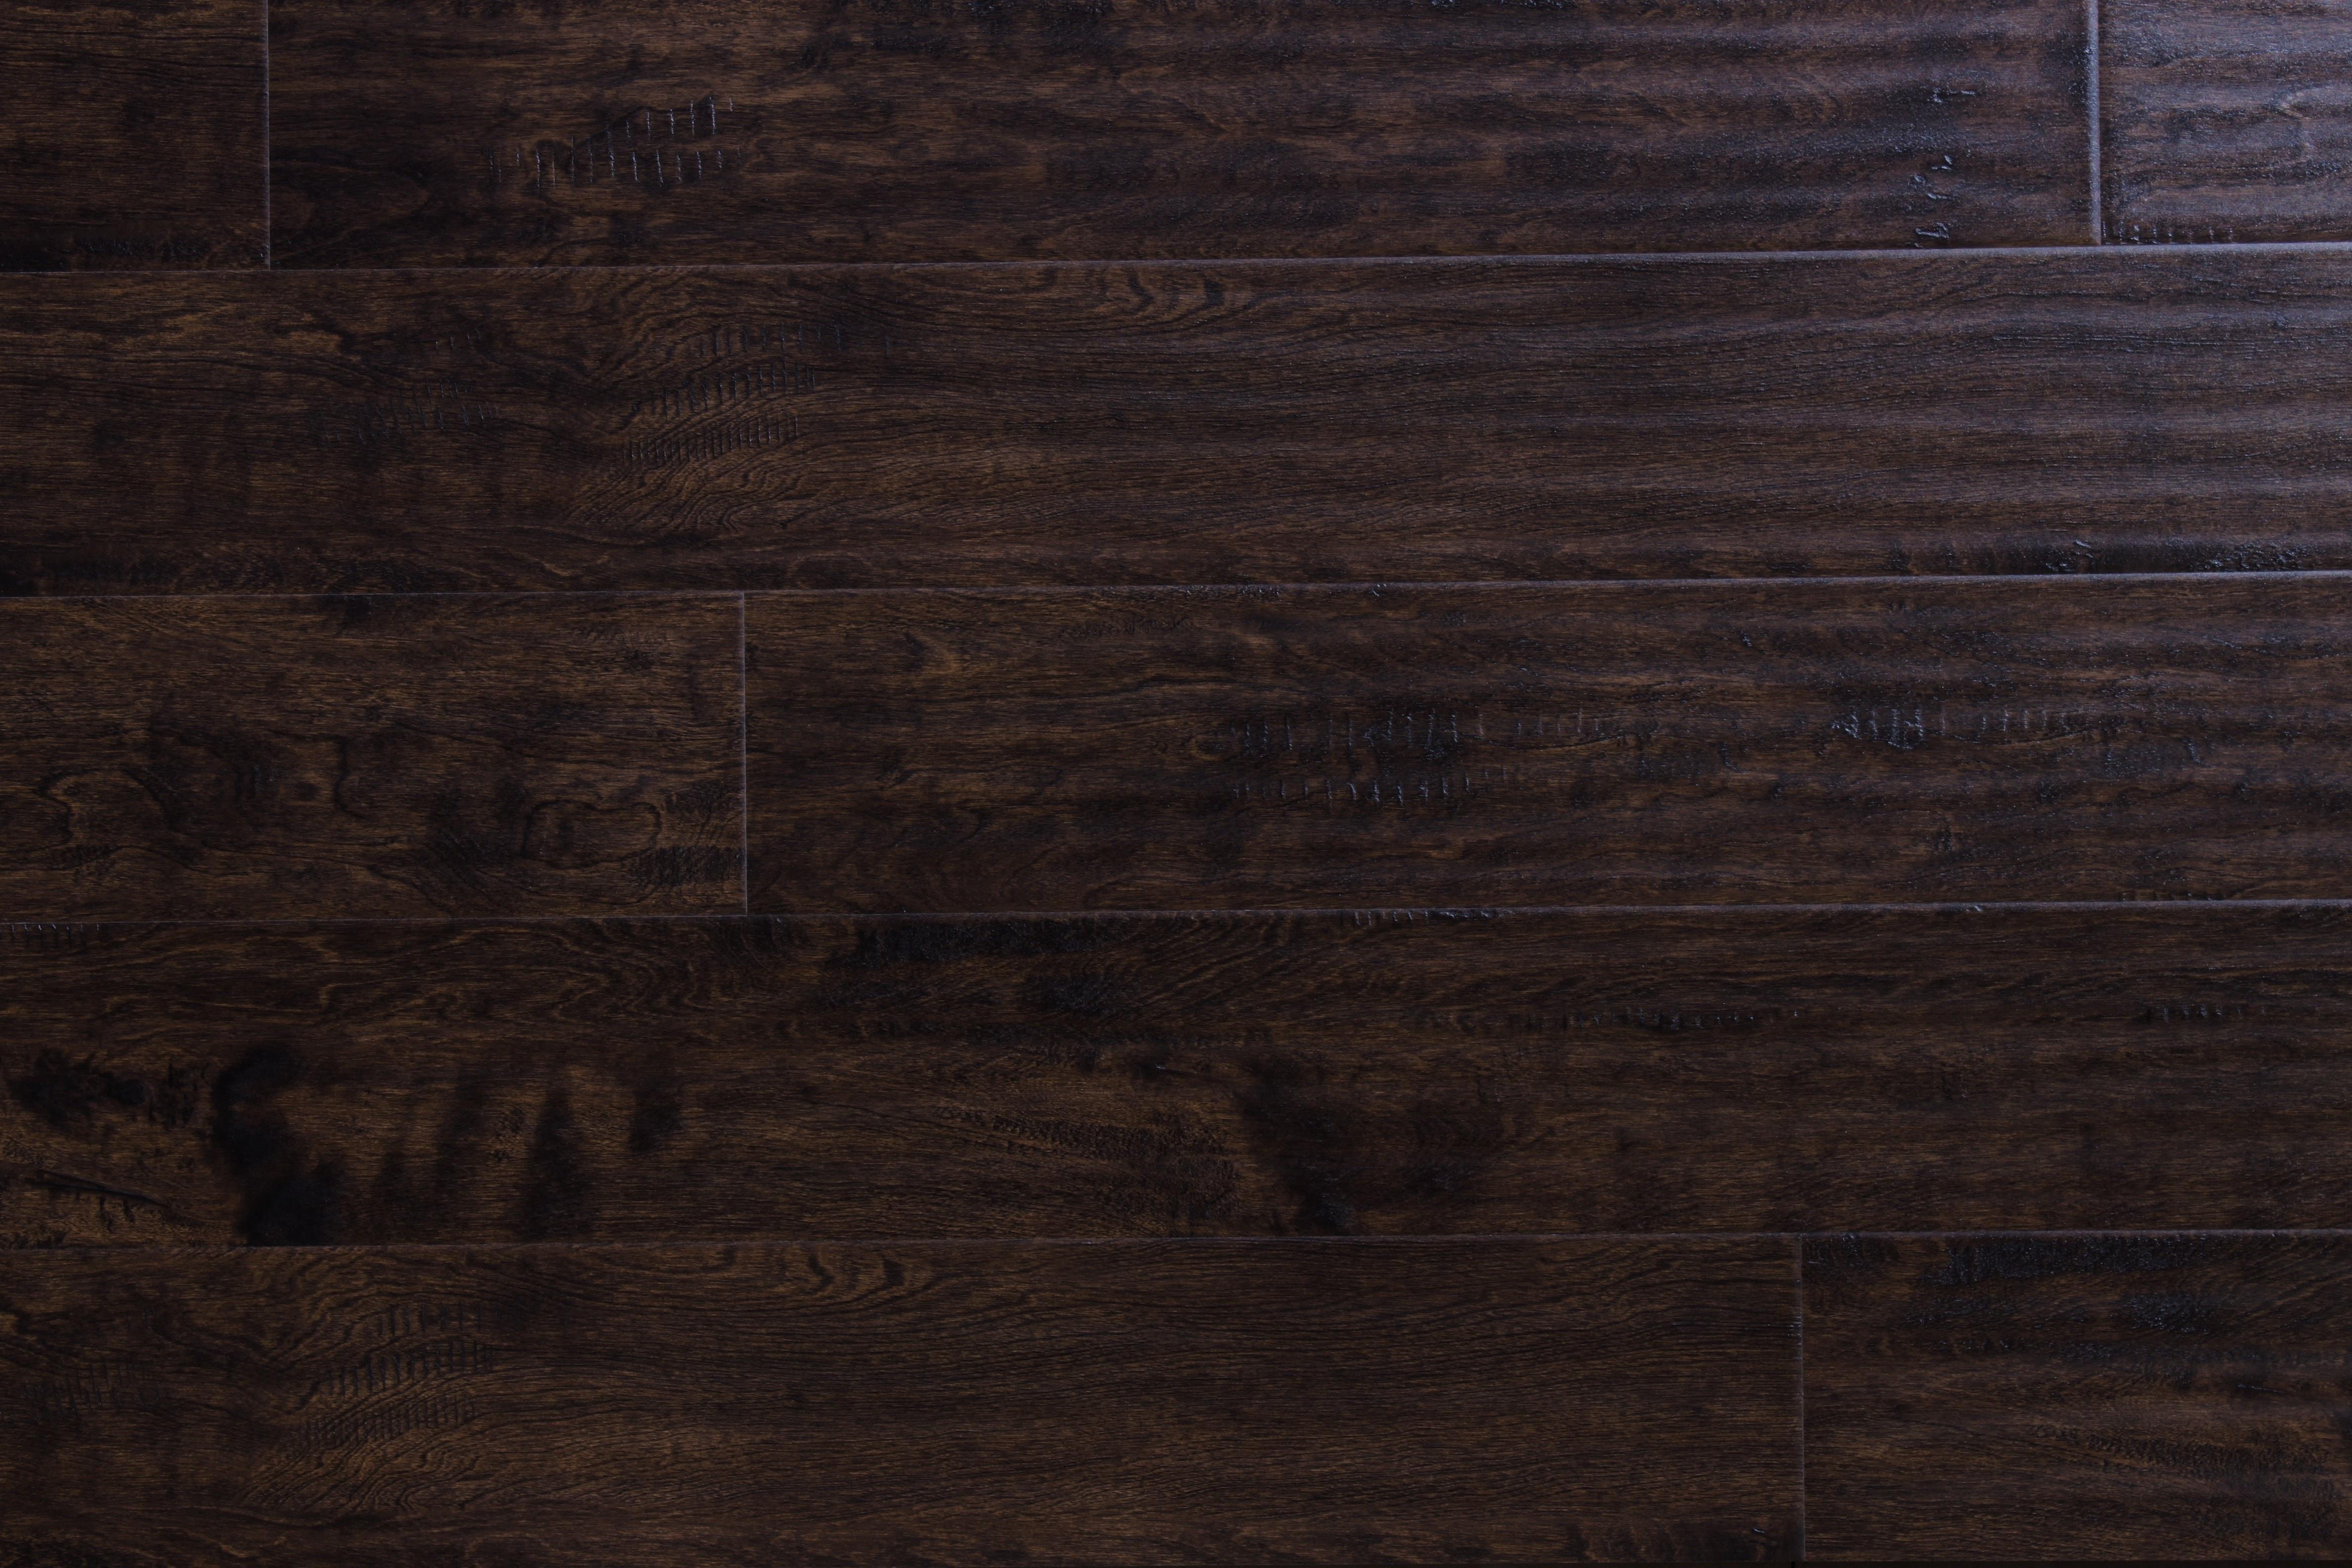 random width hickory hardwood flooring of wood flooring free samples available at builddirecta inside tailor multi gb 5874277bb8d3c